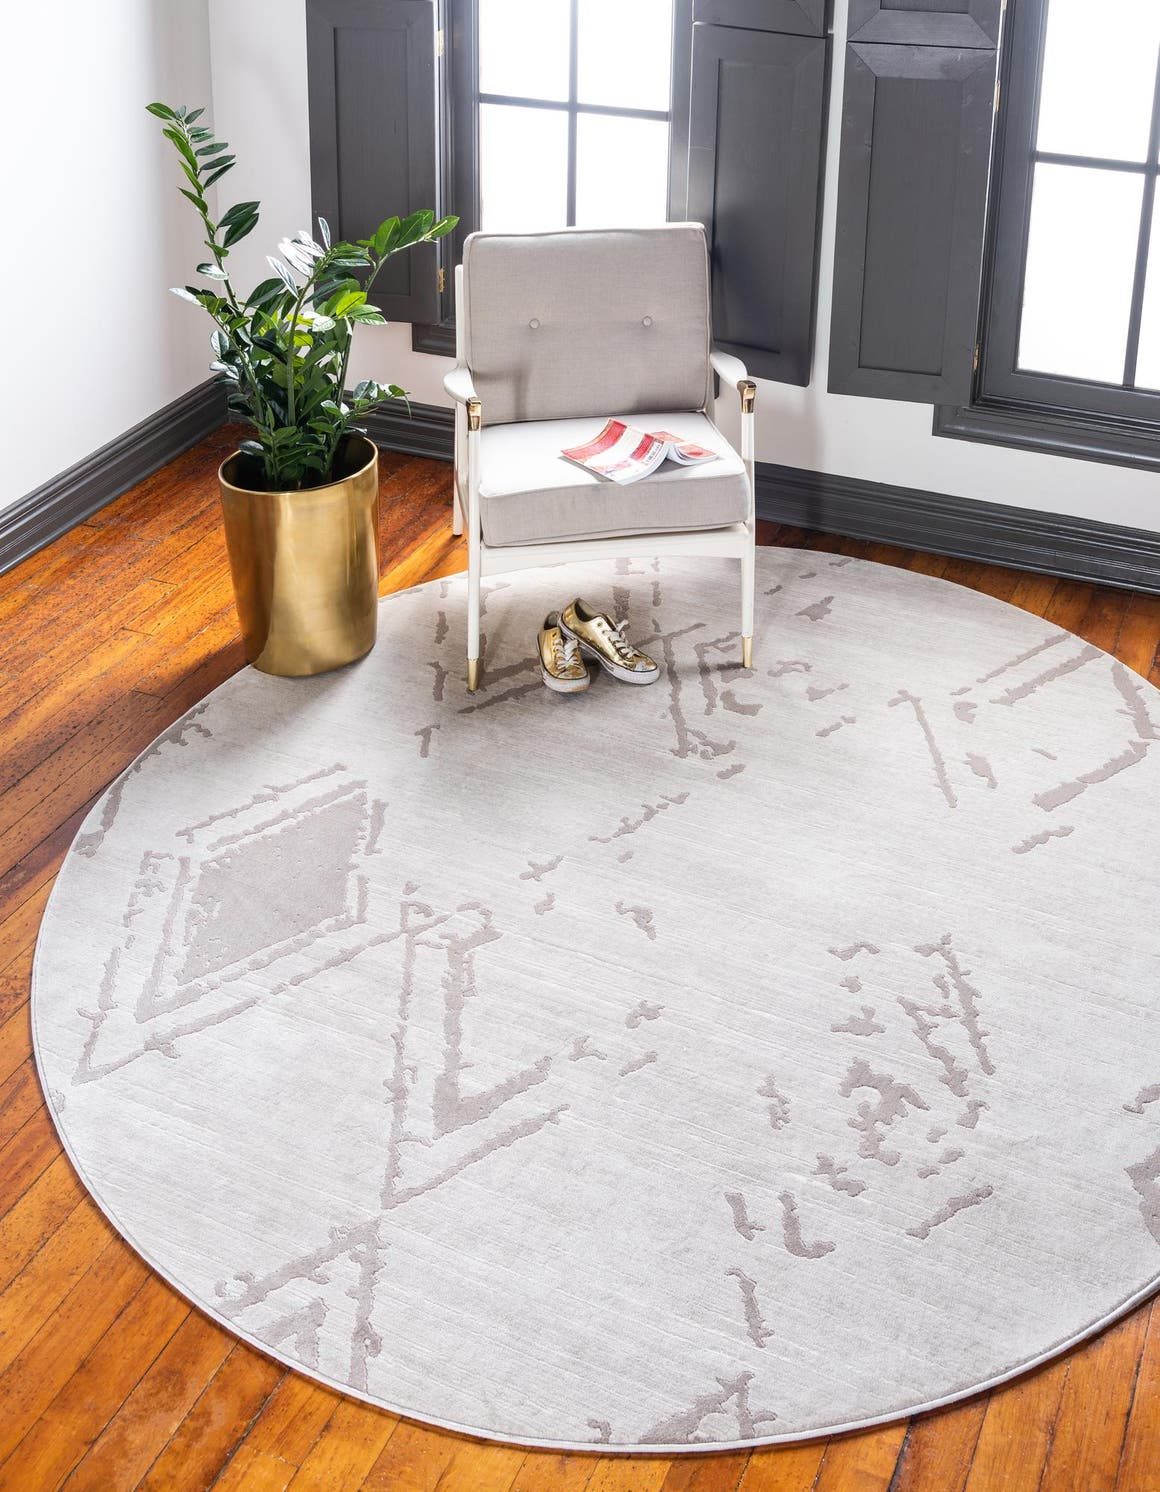 Jill Zarin 8' x 8' Uptown Round Rug main image